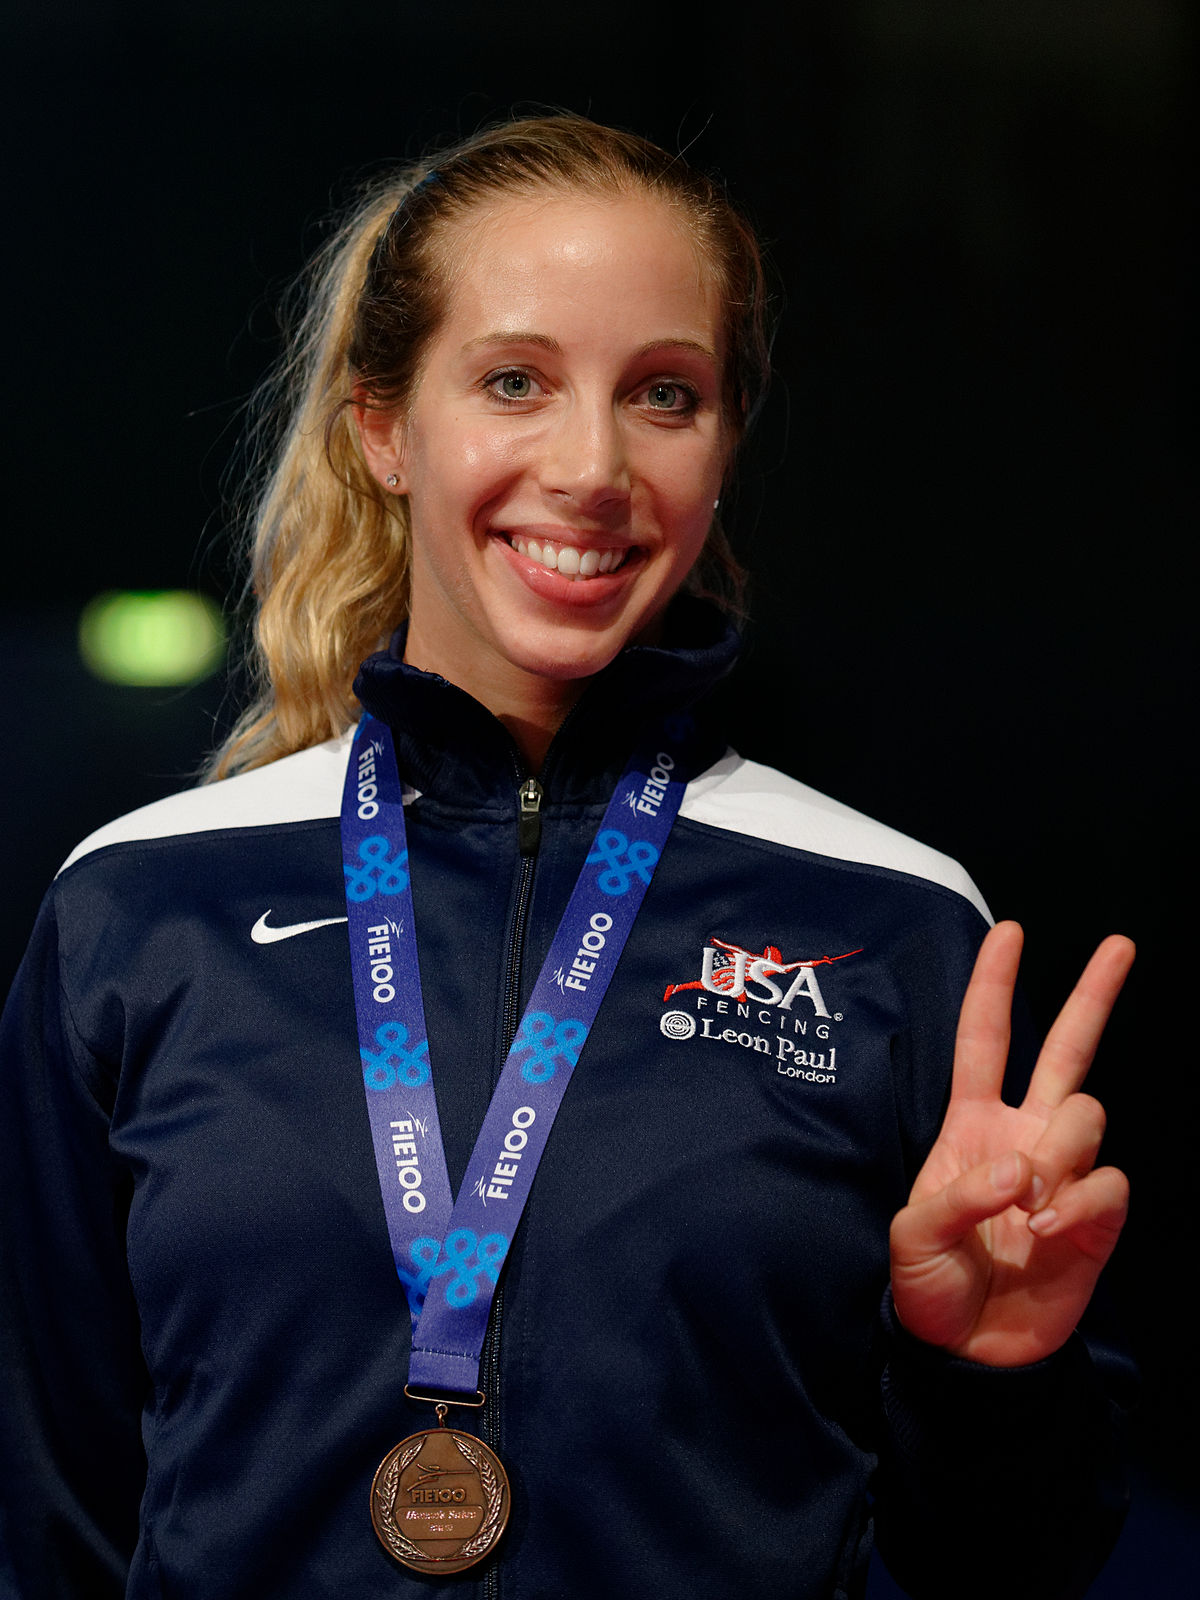 Sada Jacobson US saber fencer, ranked 1 in the world, Olympic silver Sada Jacobson US saber fencer, ranked 1 in the world, Olympic silver new images